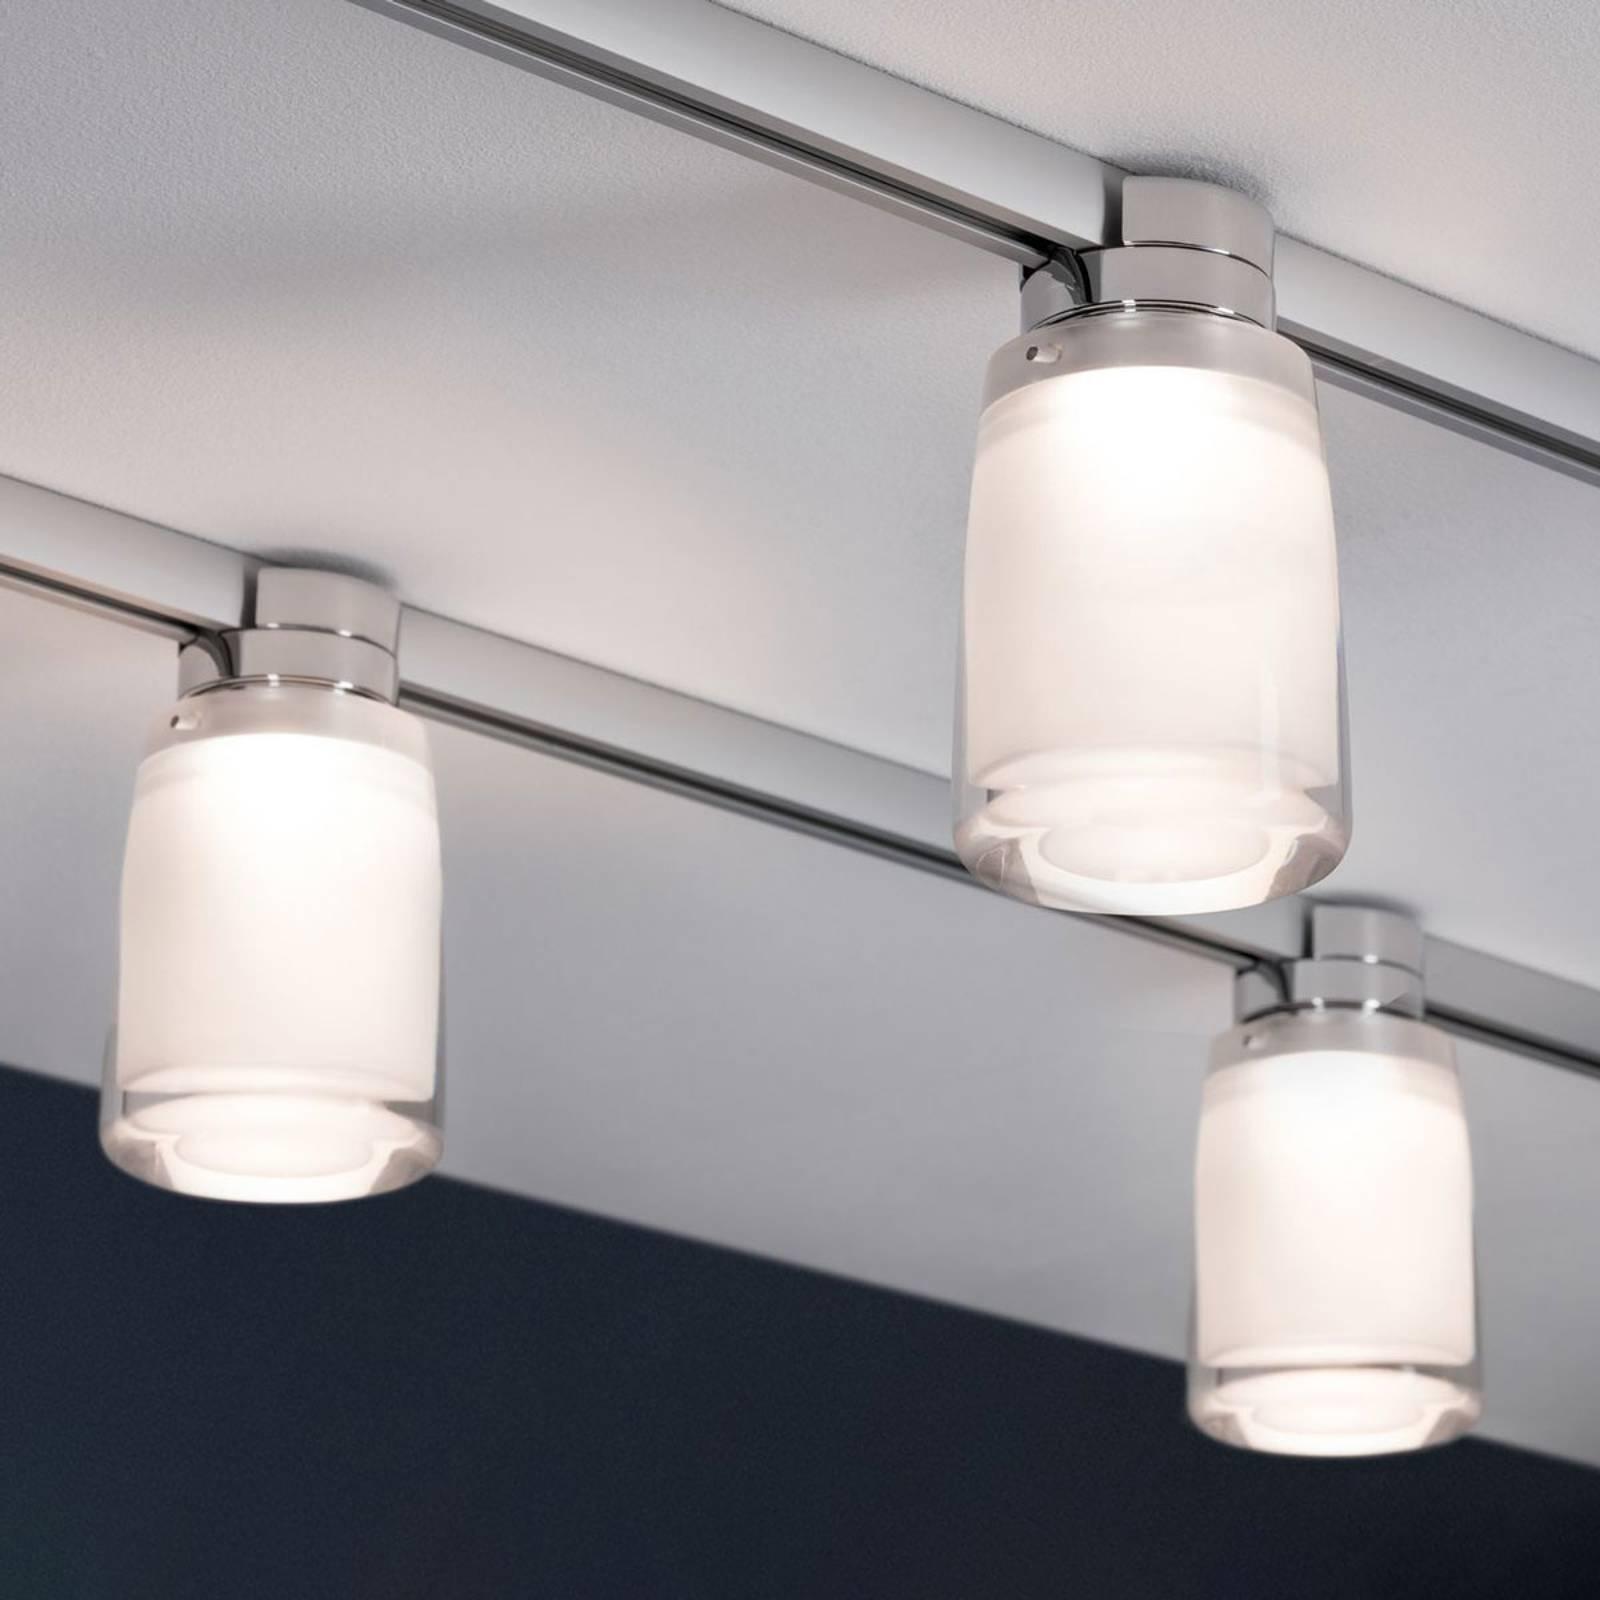 Paulmann URail Safira -LED-spotti akryylivarjostin